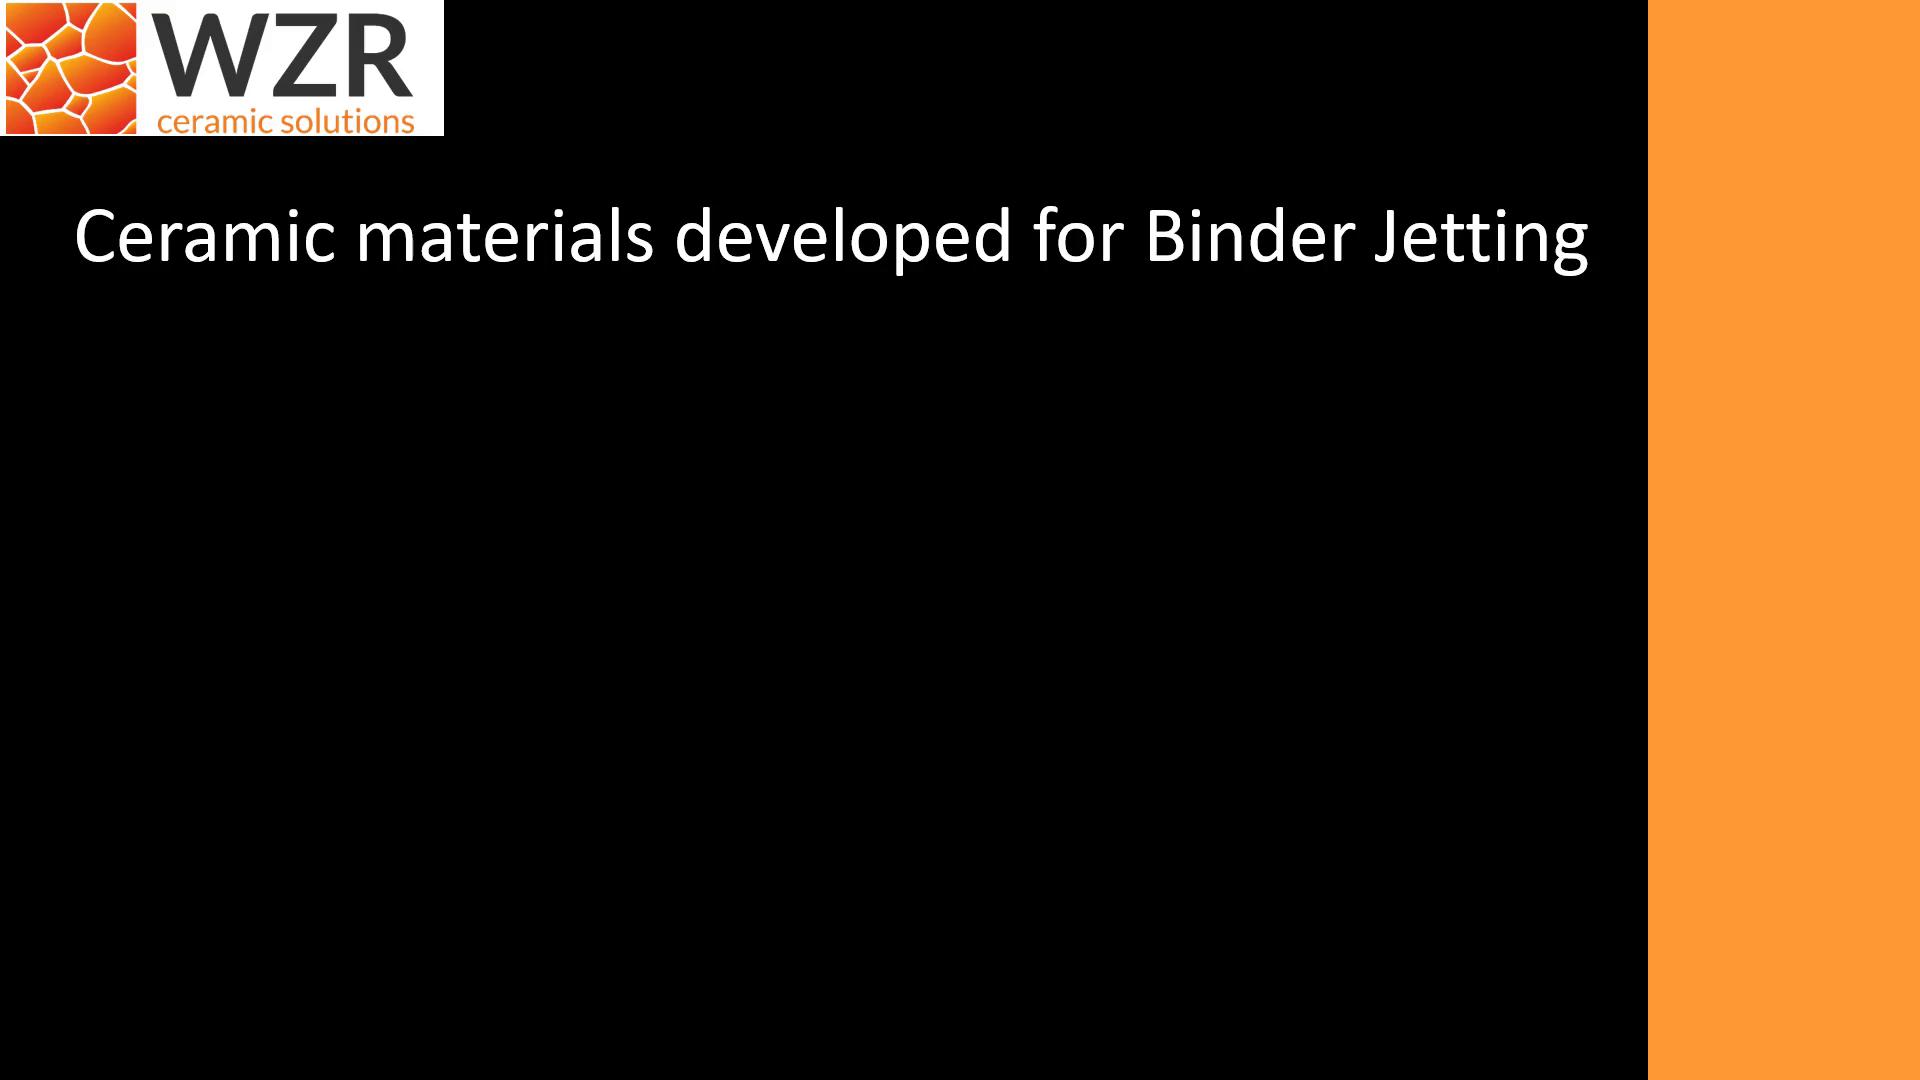 Ceramic materials developed for Binder Jetting